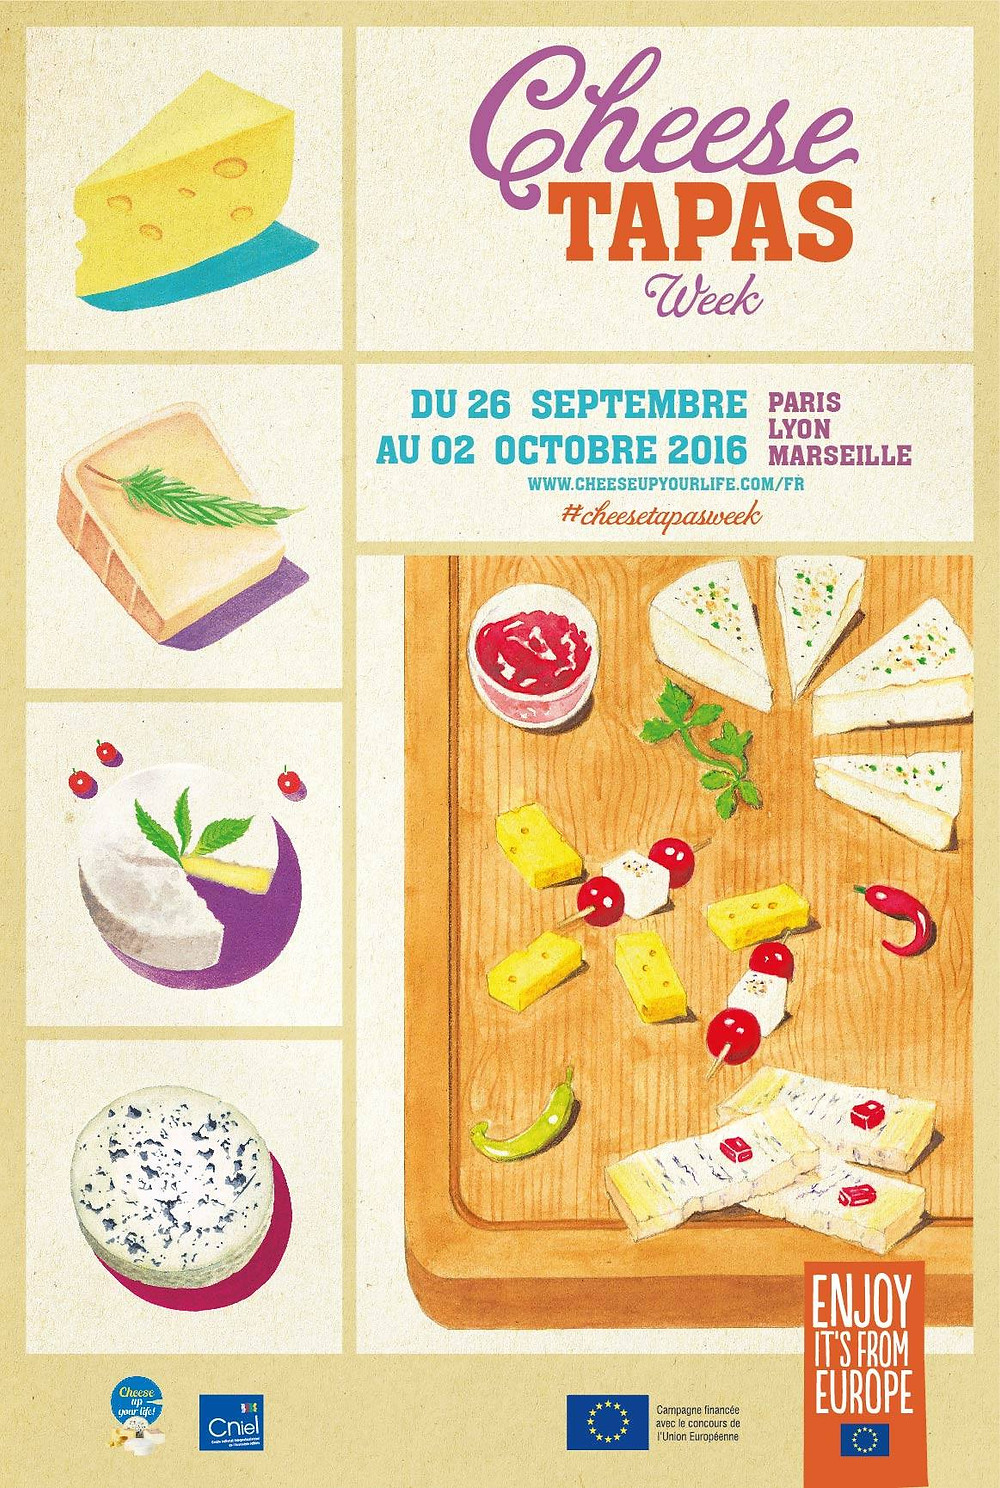 cheese tapas week